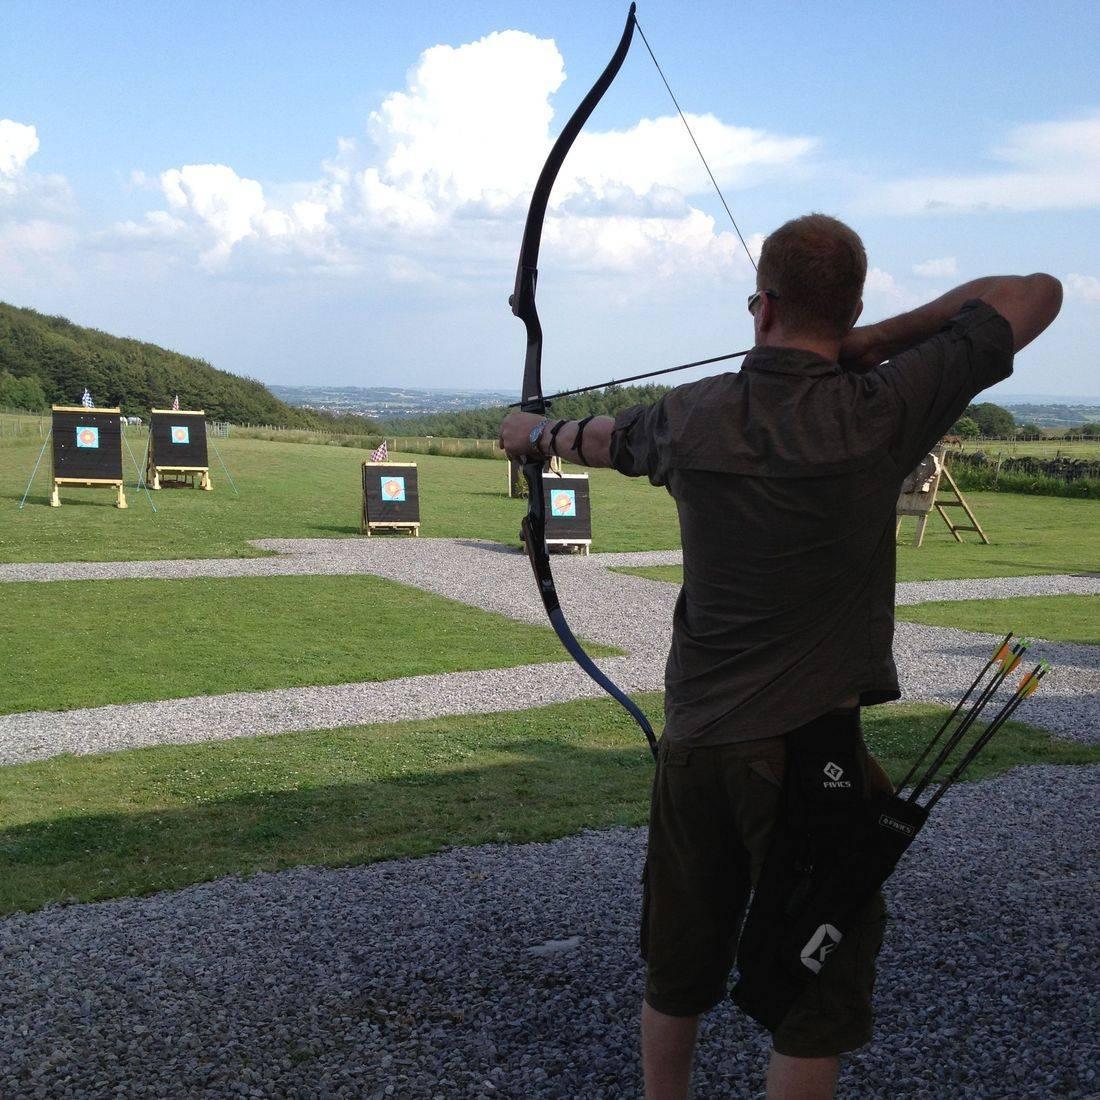 Archery experiences Sheffield